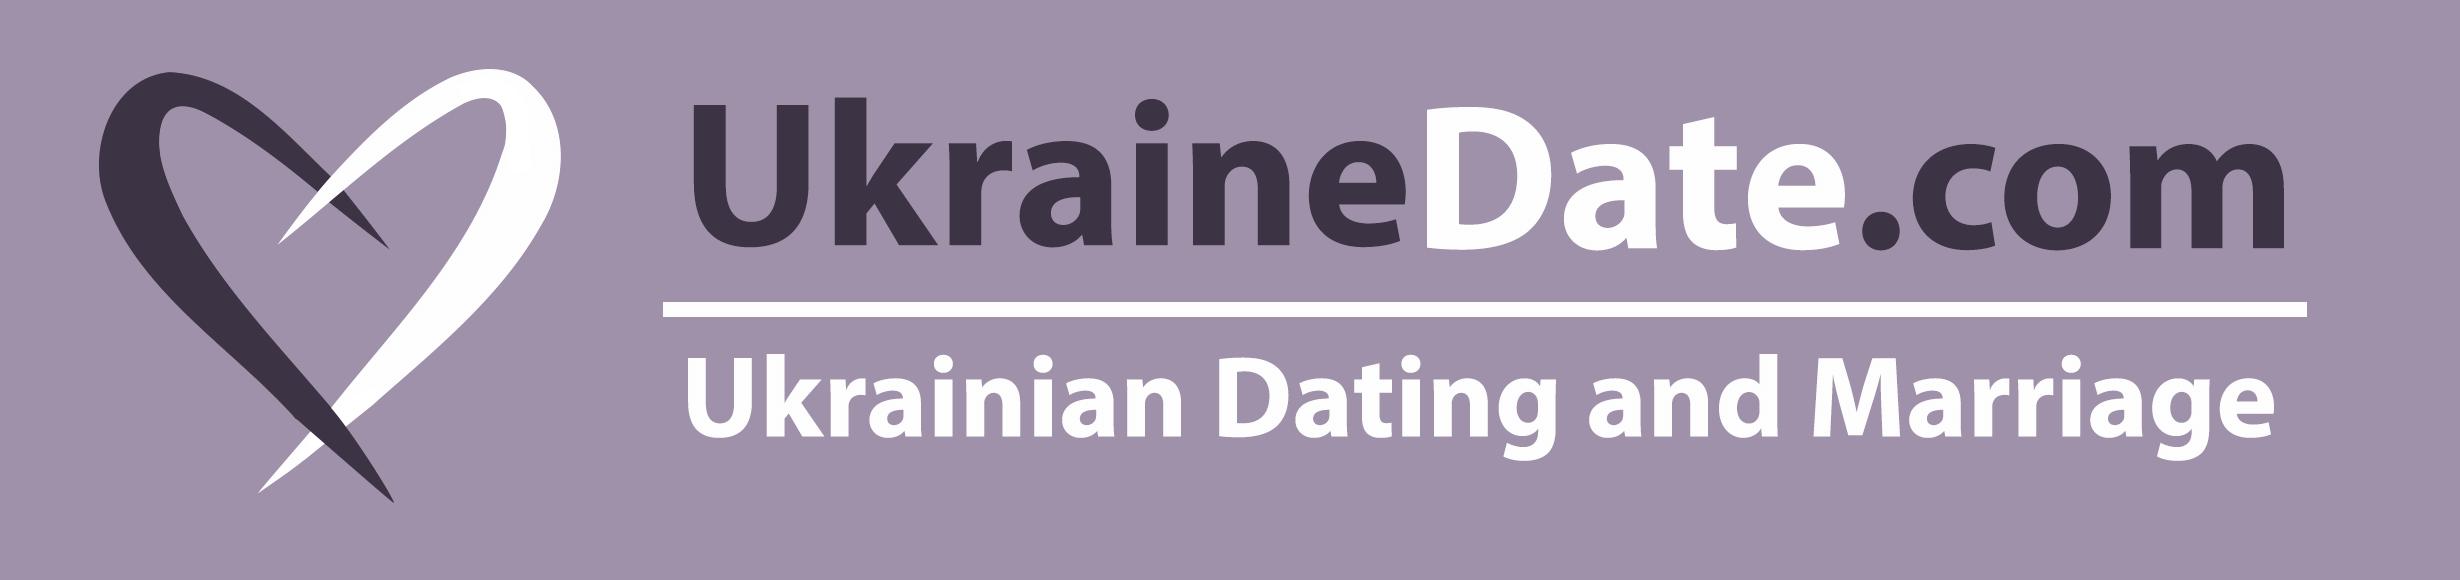 Ukraine Date